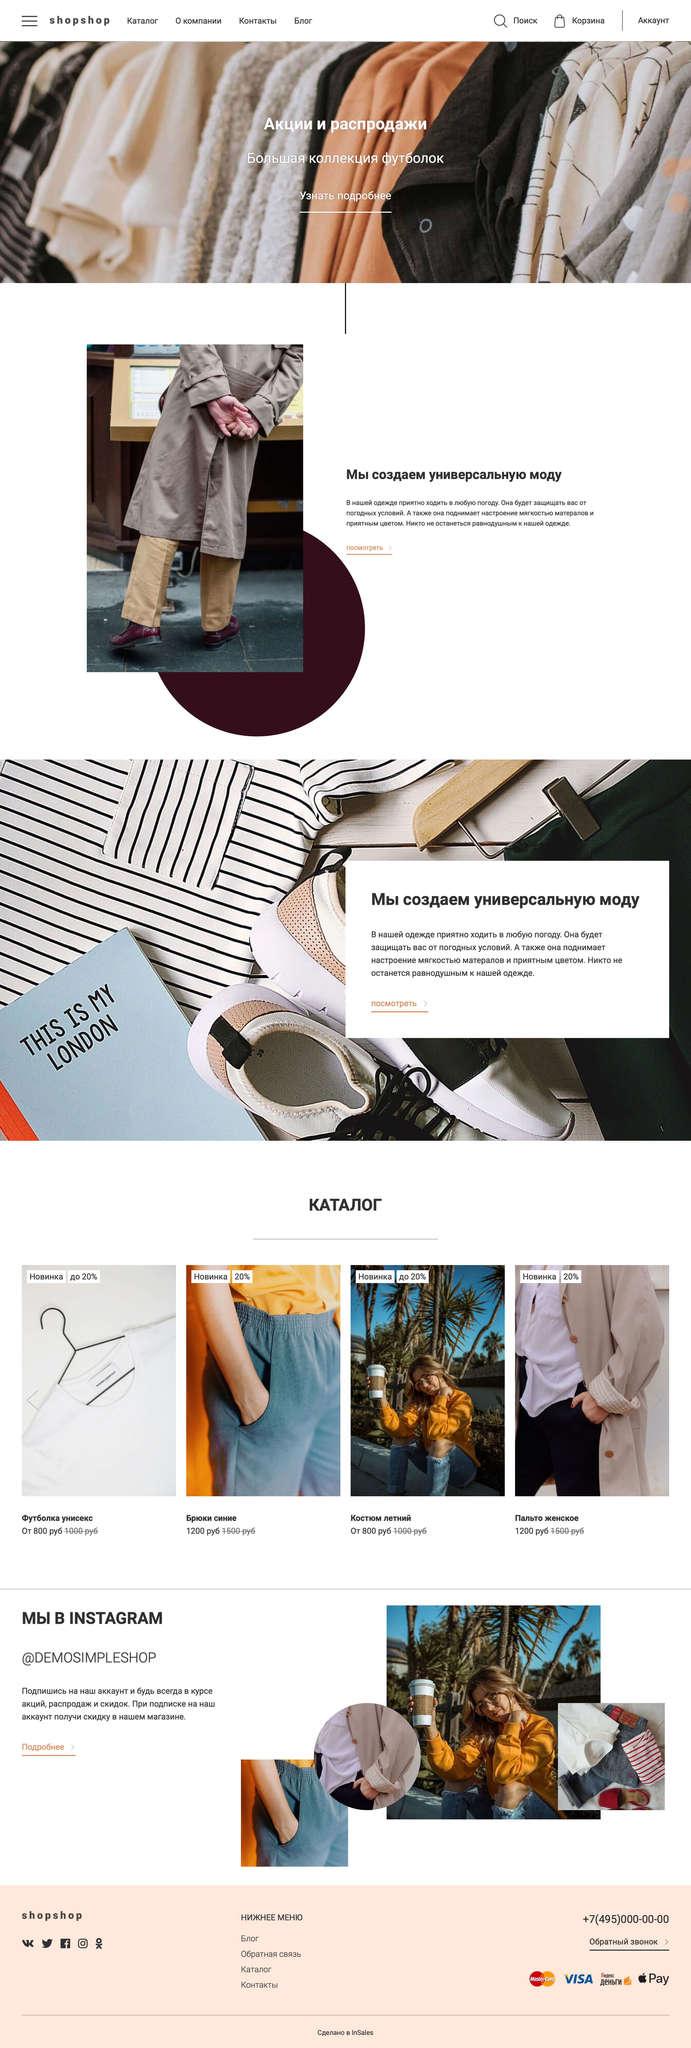 Шаблон интернет магазина - Simple